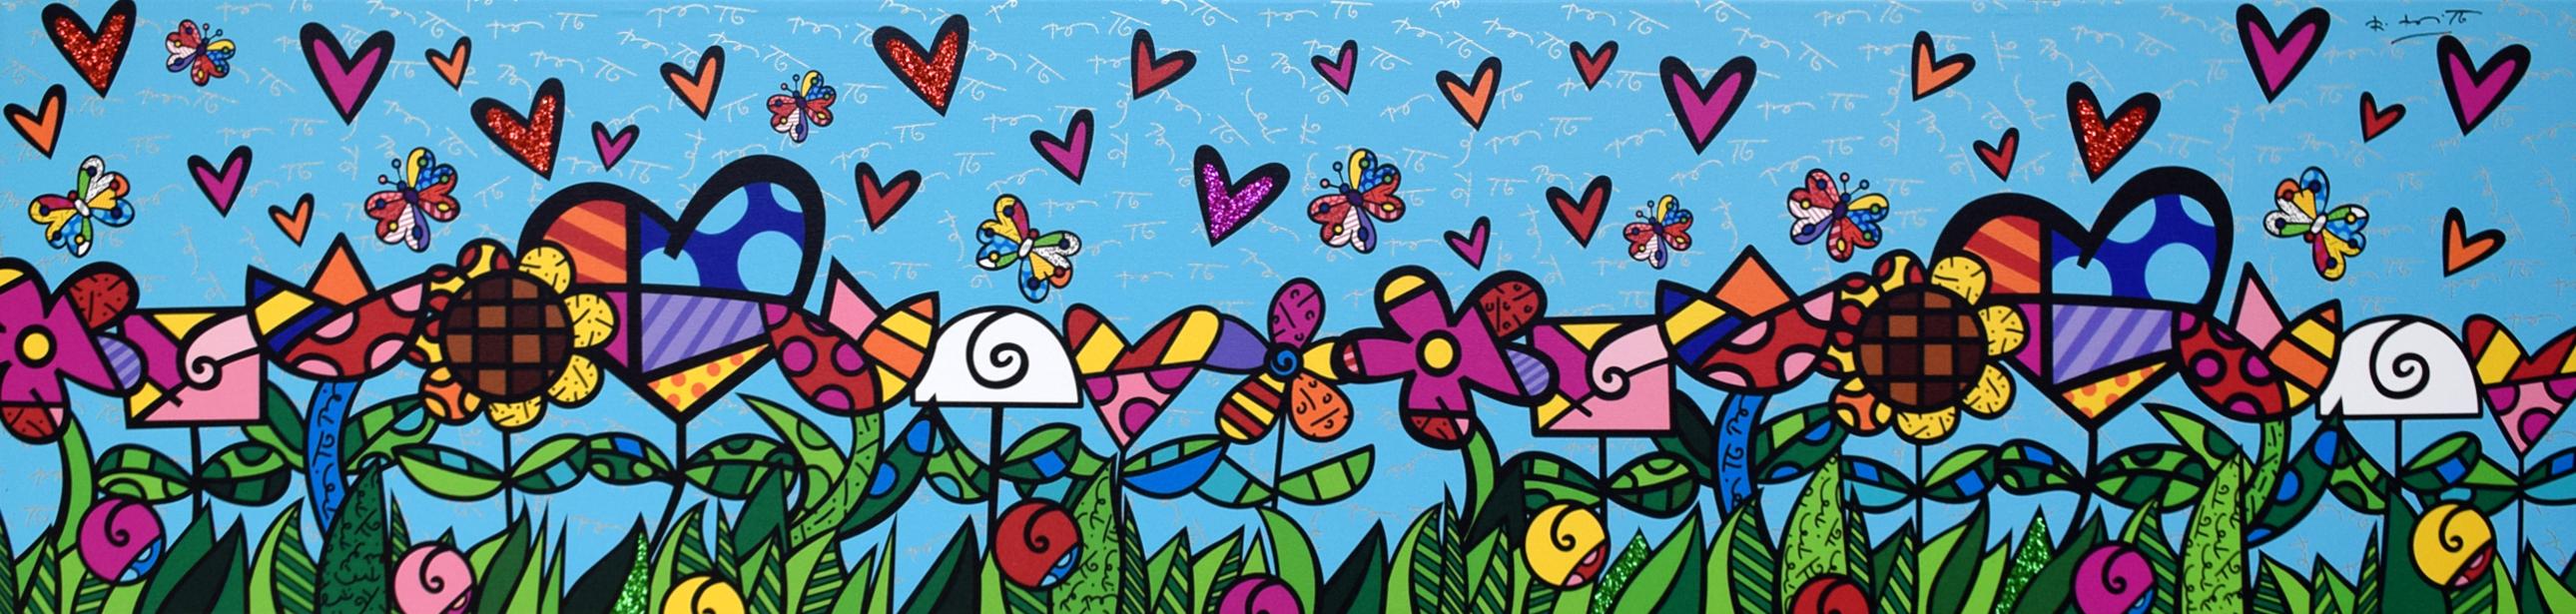 Romero Britto - Magic Garden , 5603-004-620